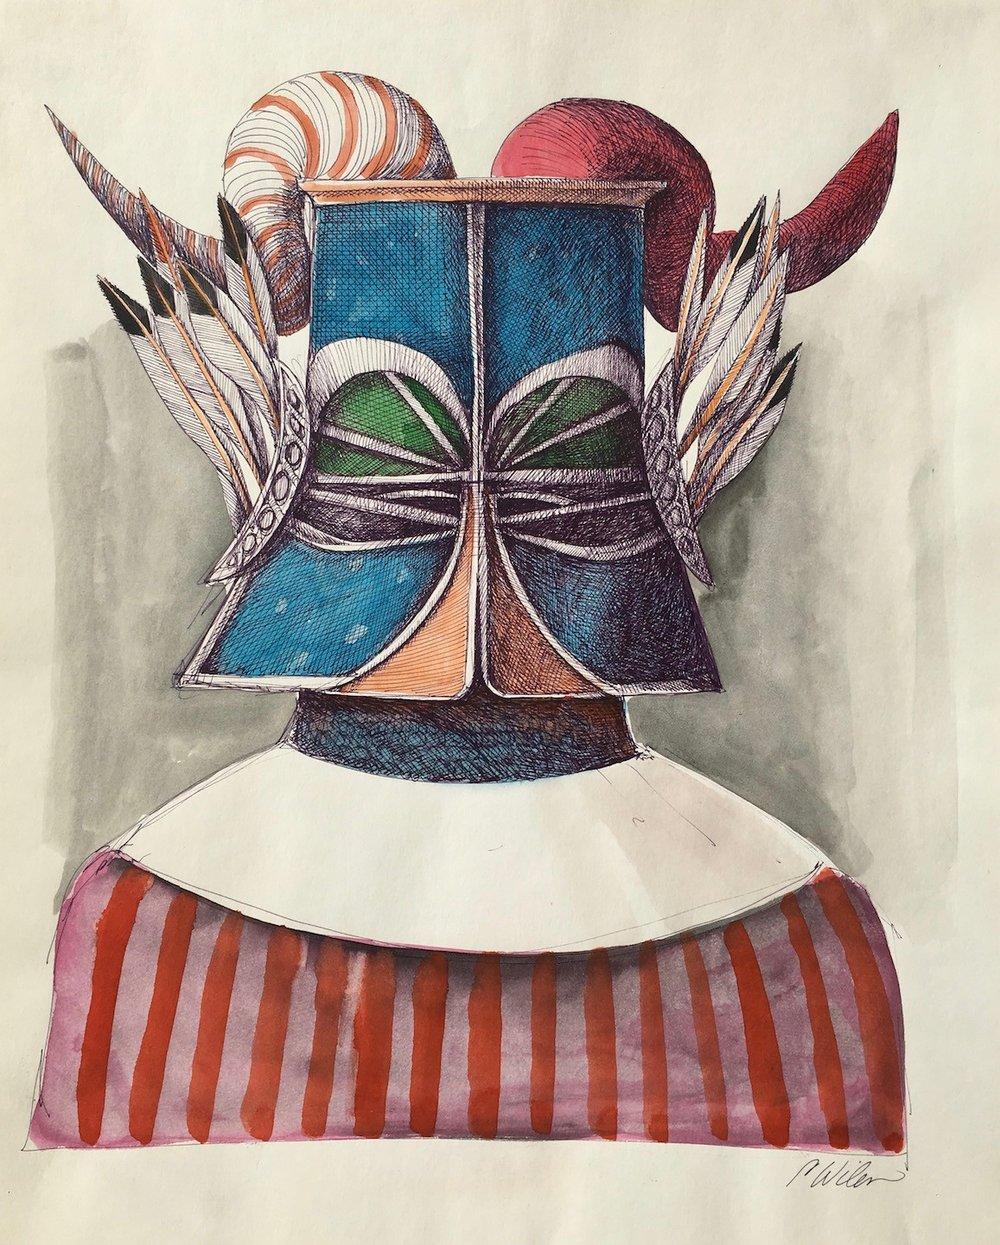 wilen_medieval_knight_v__16_x_13_watercolor_ink.jpg